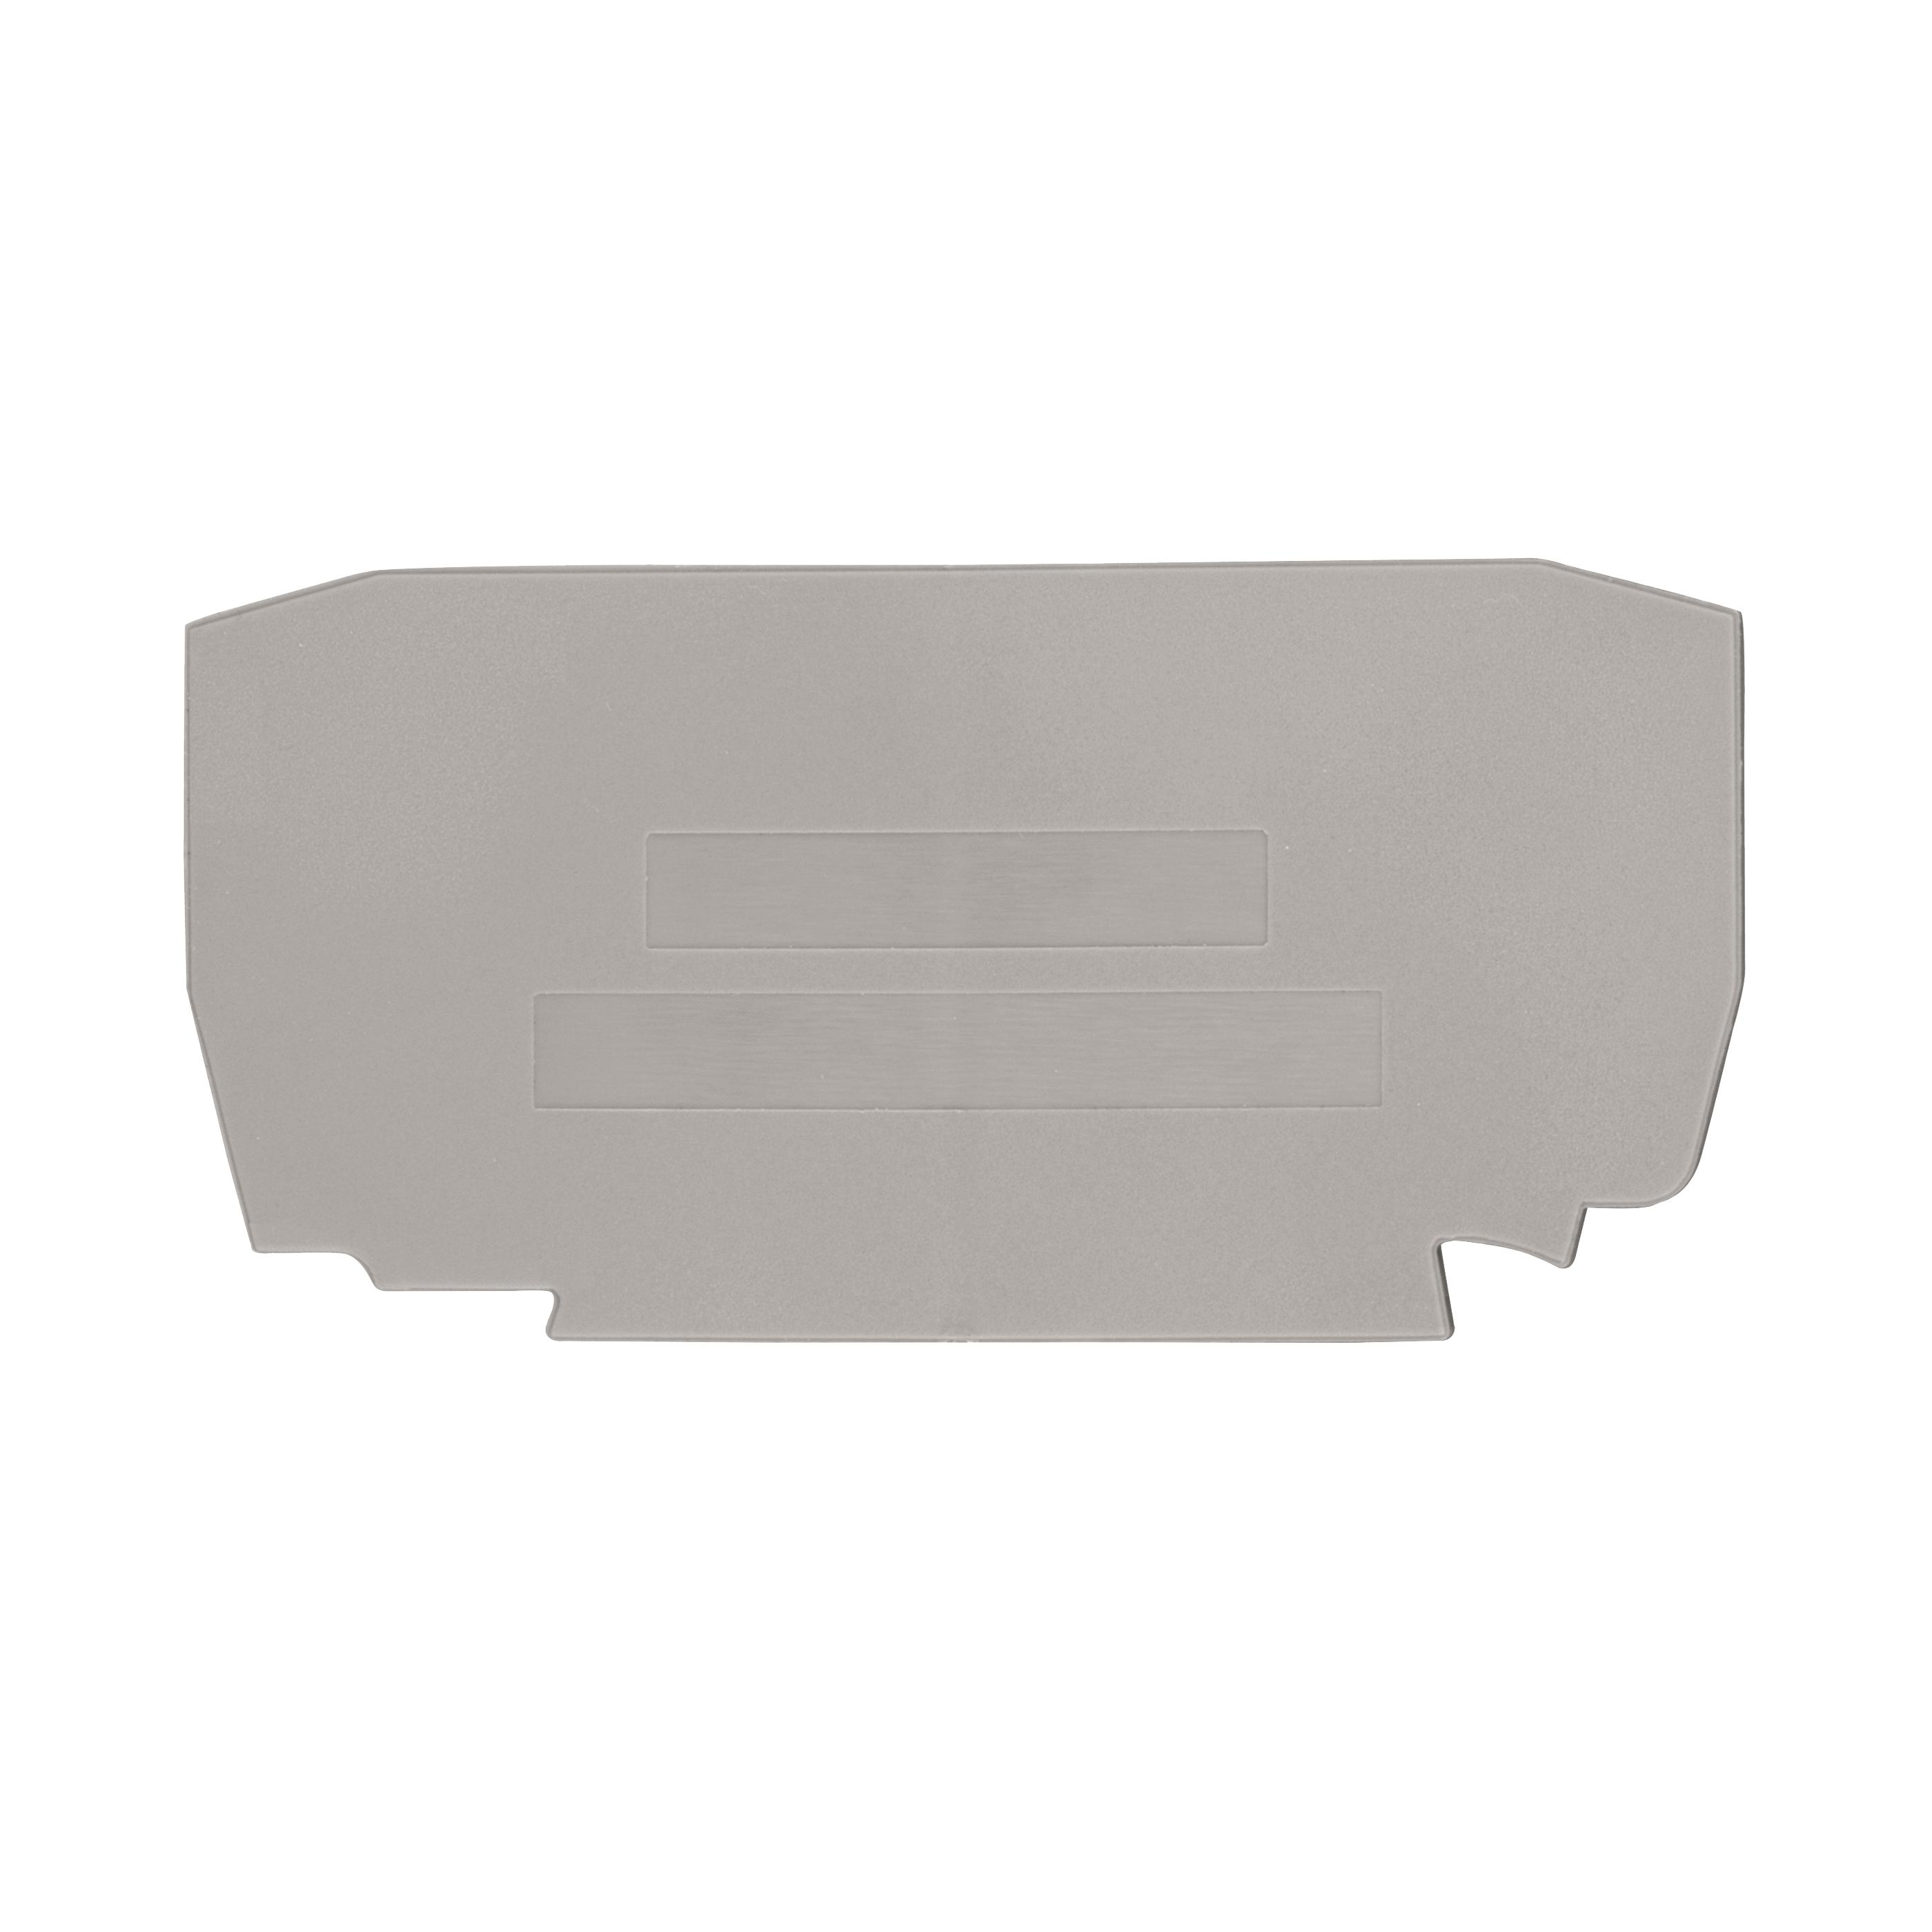 1 Stk Endplatte für Federkraftklemme YBK 4 grau IK610204--